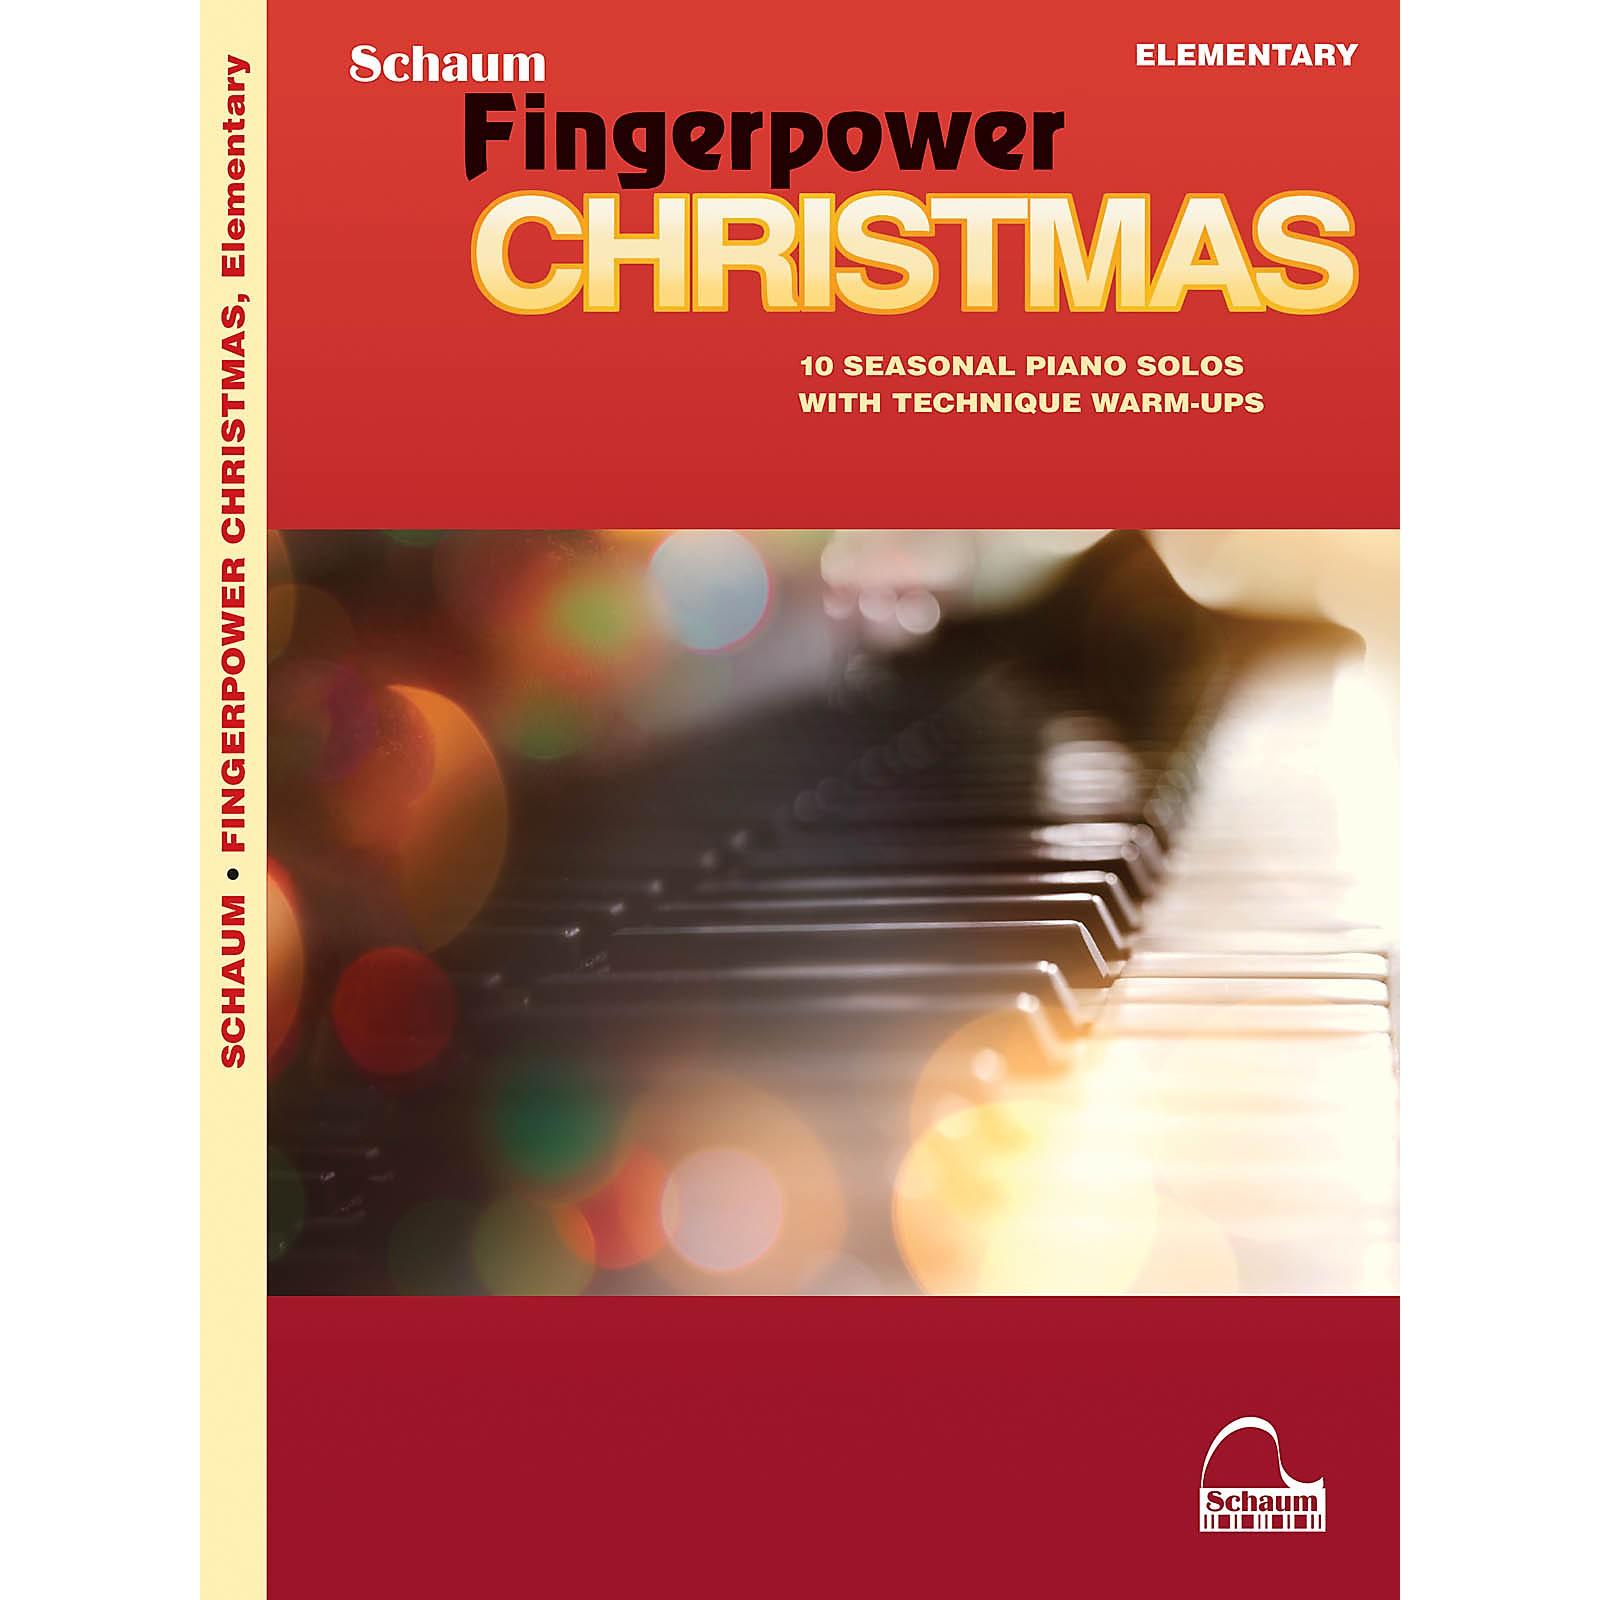 SCHAUM Fingerpower Christmas - 10 Seasonal Piano Solos with Technique Warm-Ups